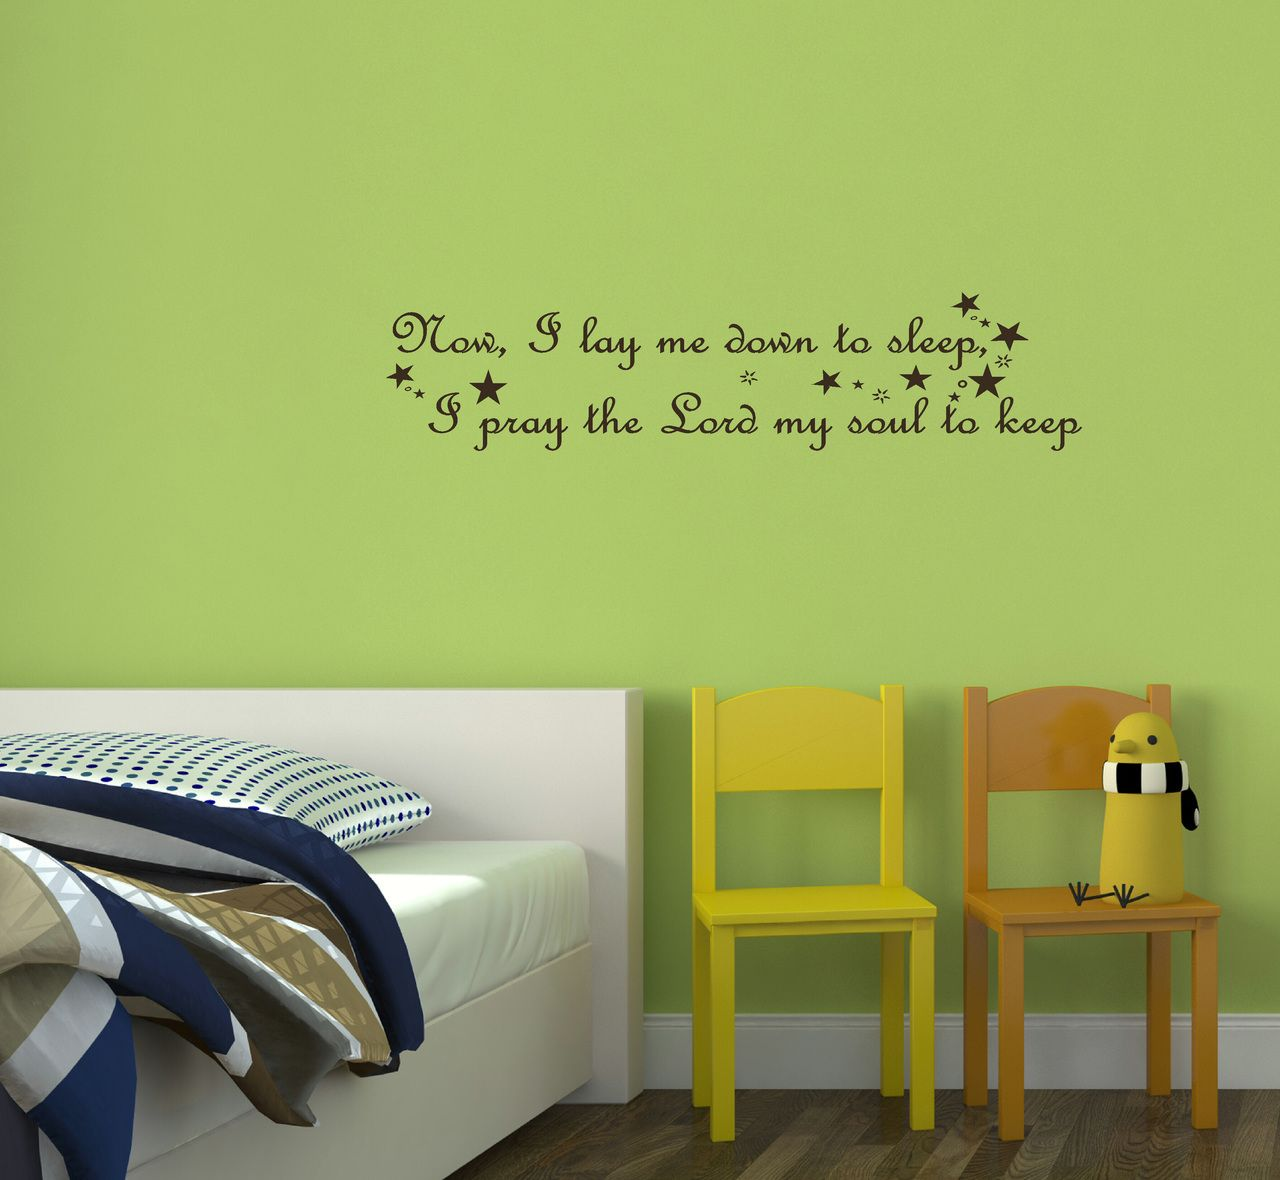 Now i lay me down to sleep wall decal - Now I Lay Me Down To Sleep I Pray The Lord My Soul To Keep Bedroom Wall Saying I Pray The O Jays And Sleep